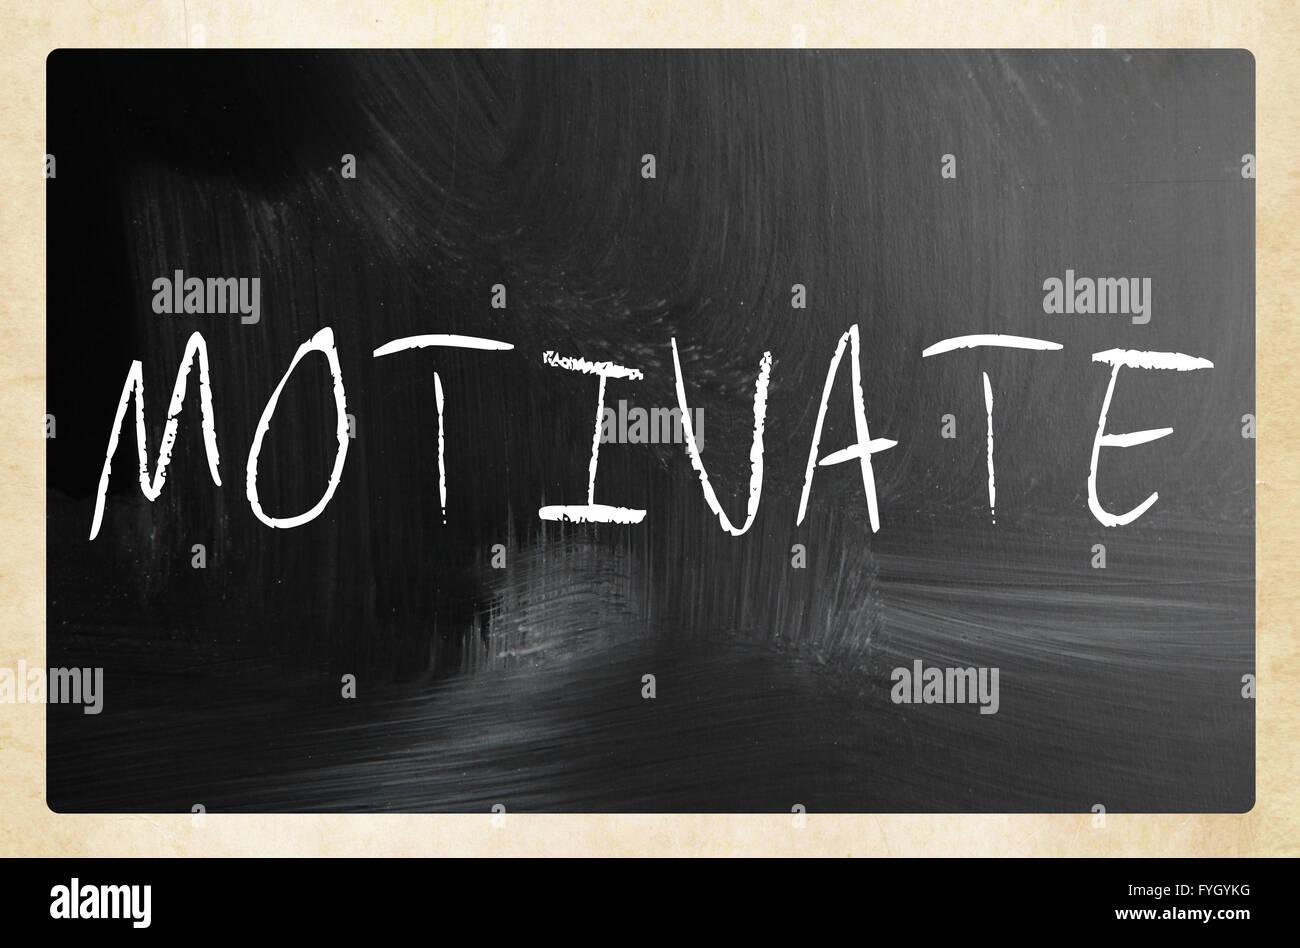 motivate handwritten with white chalk on a blackboard - Stock Image